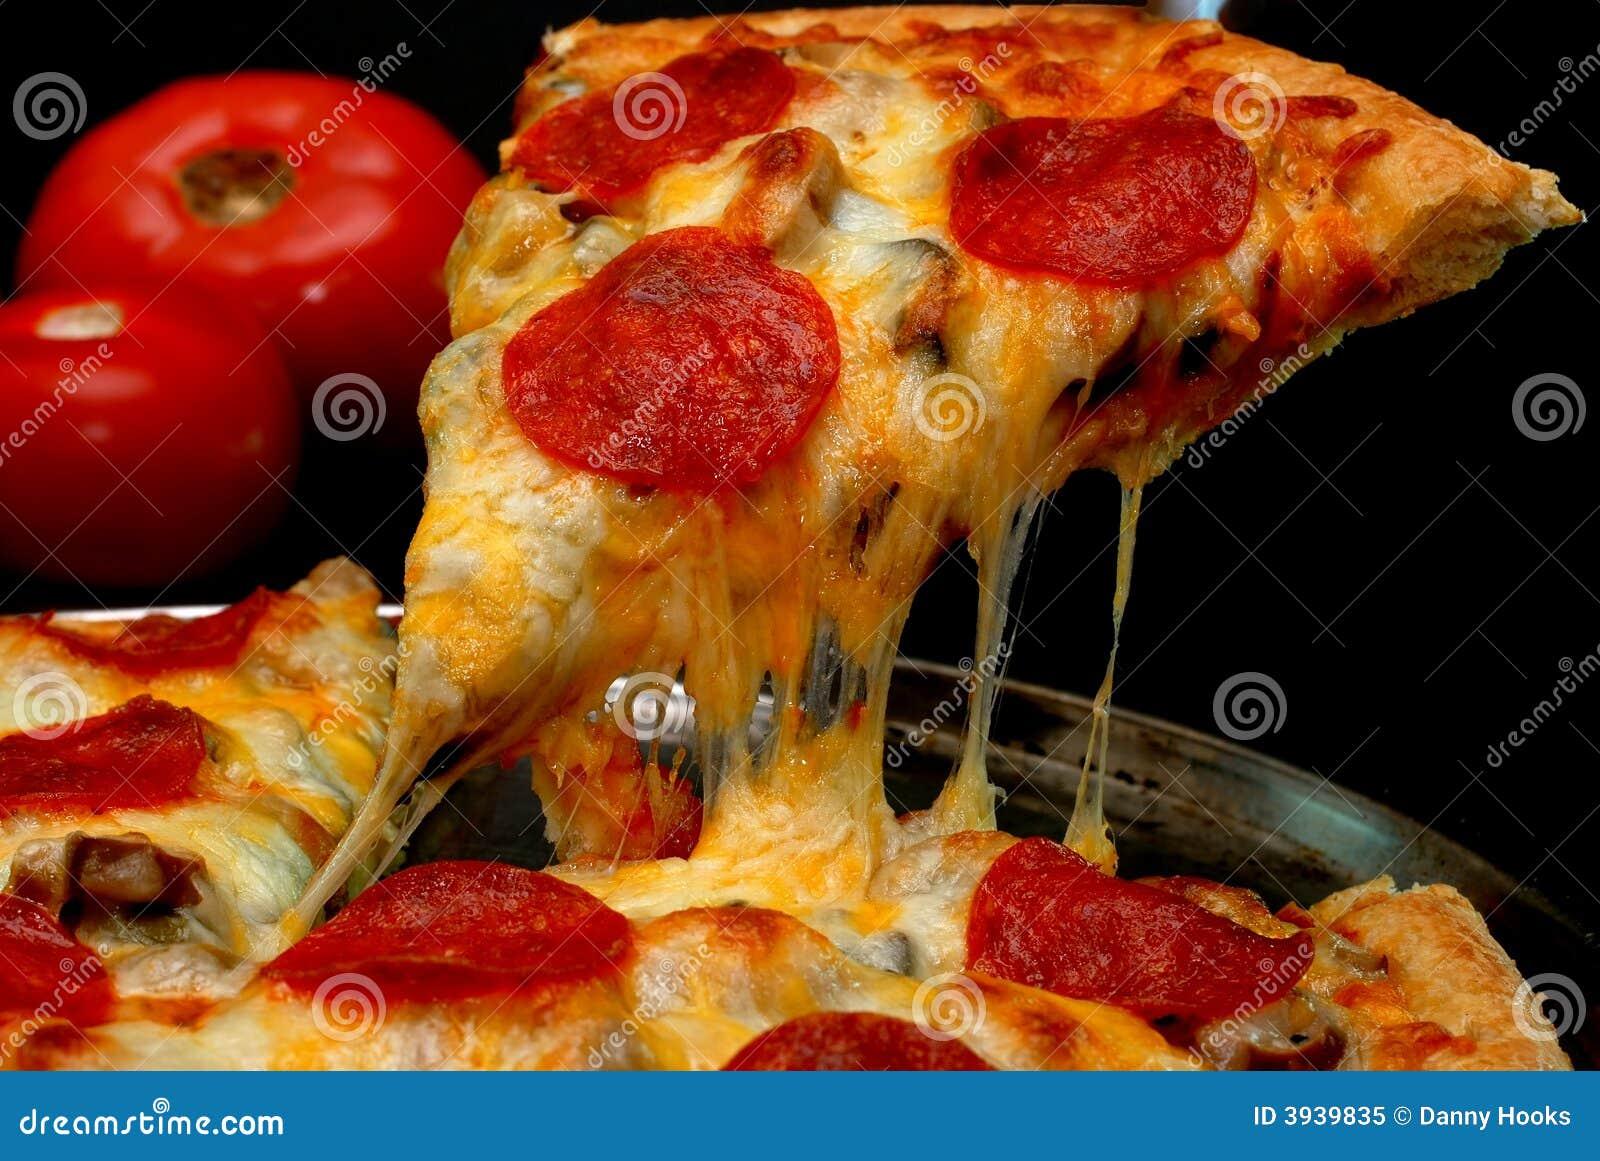 Part de pizza de pepperoni